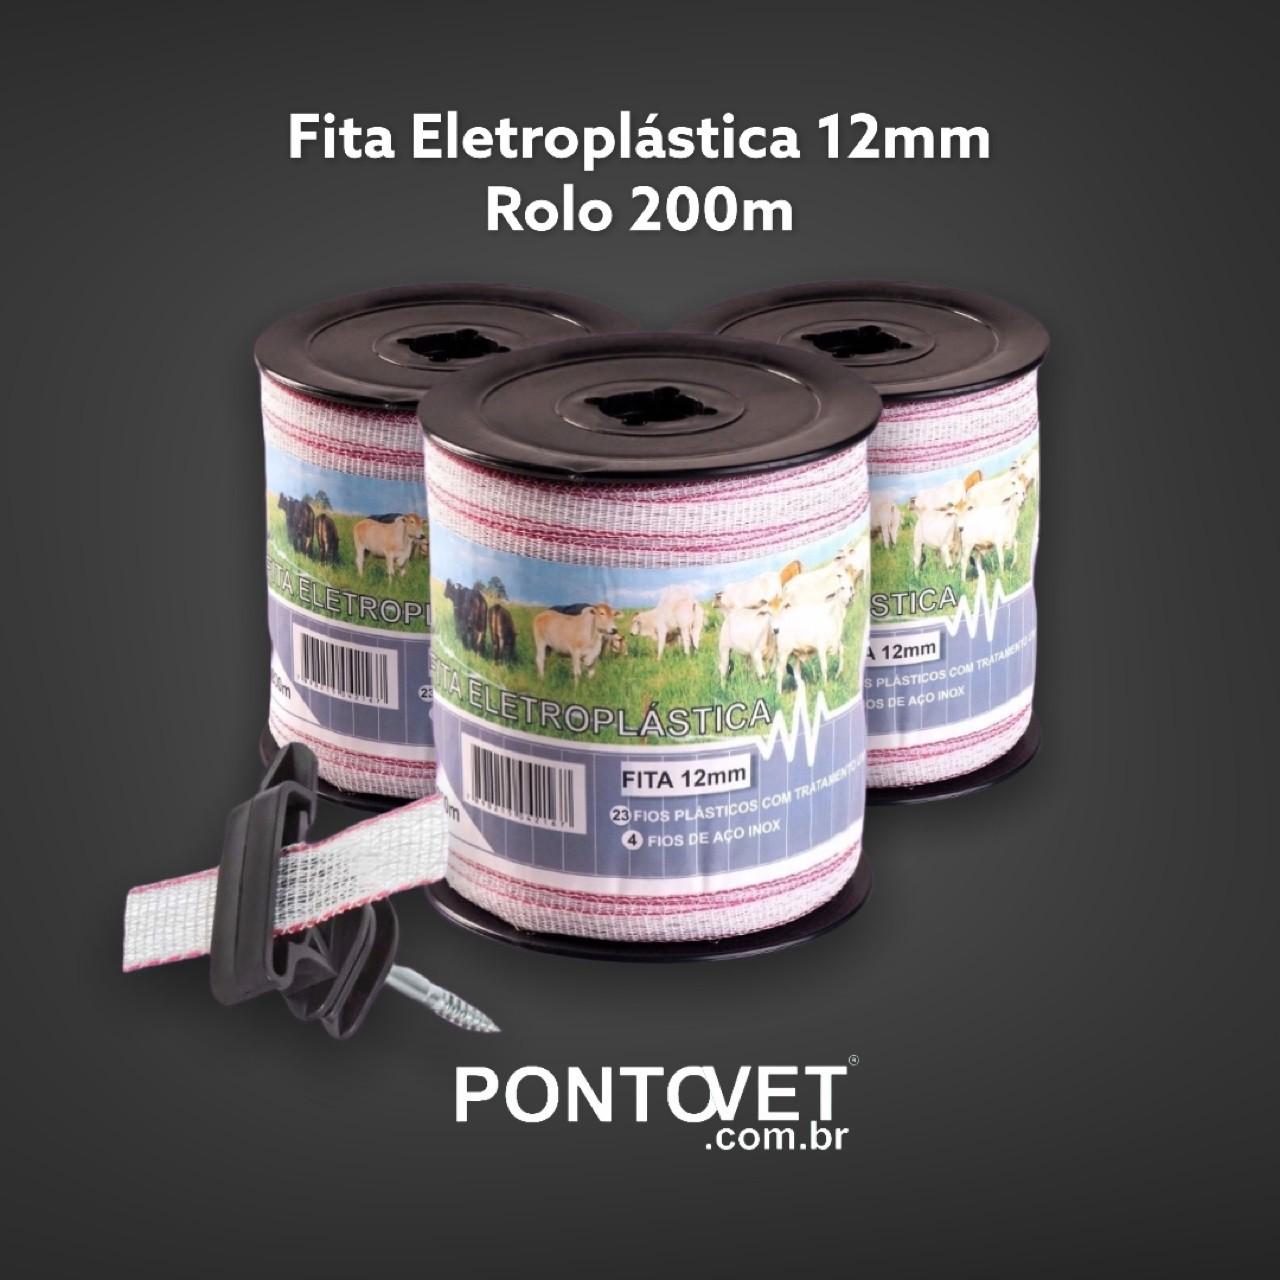 Fita Eletroplástica 12mm (rolo 200m)